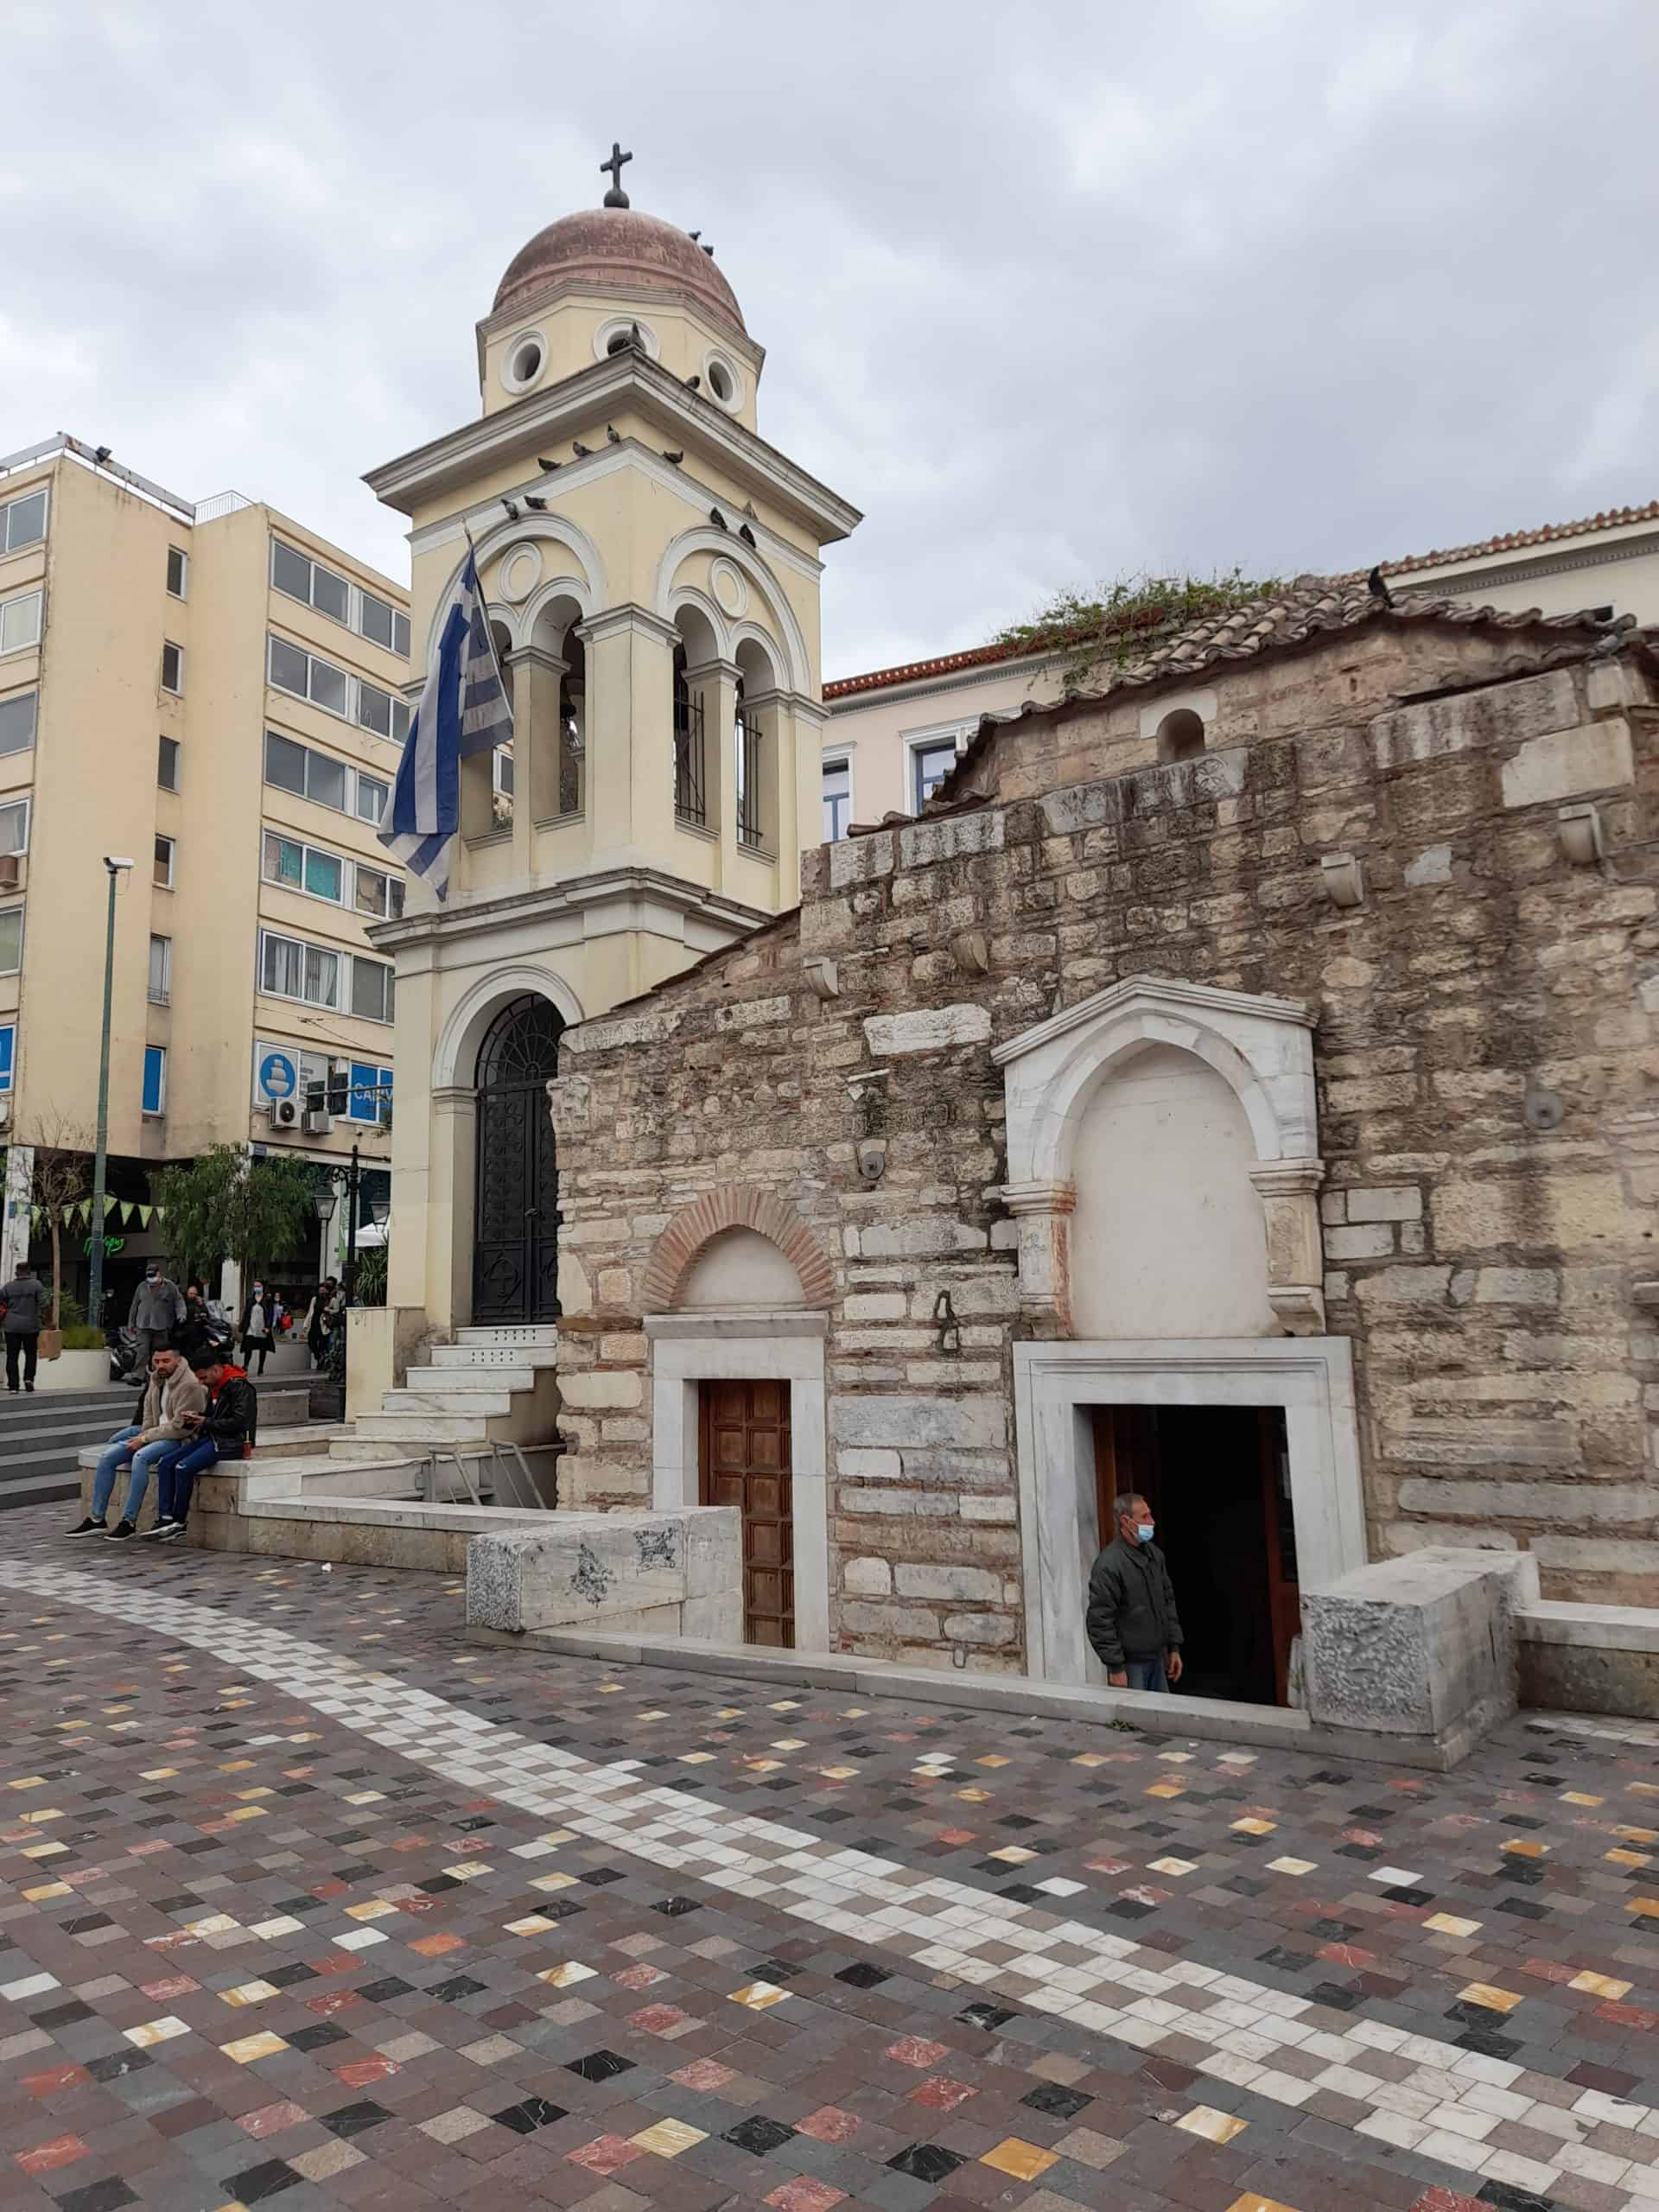 Athens churches: The Church of the Pantanassa